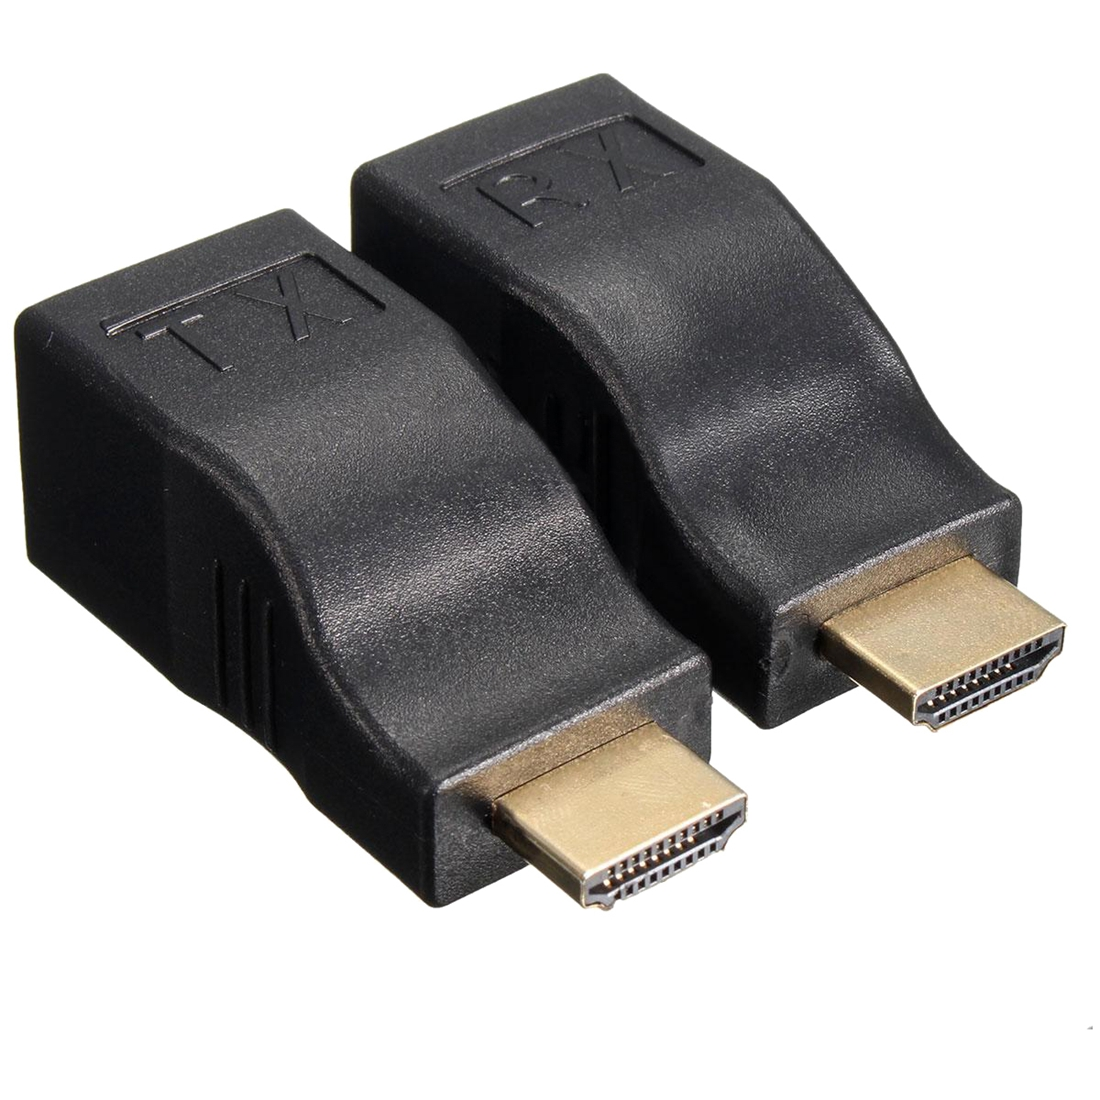 4 К HD 1080 P 3D HDMI Extender над двойной RJ45 cat 5e/6 Ethernet сетевой адаптер